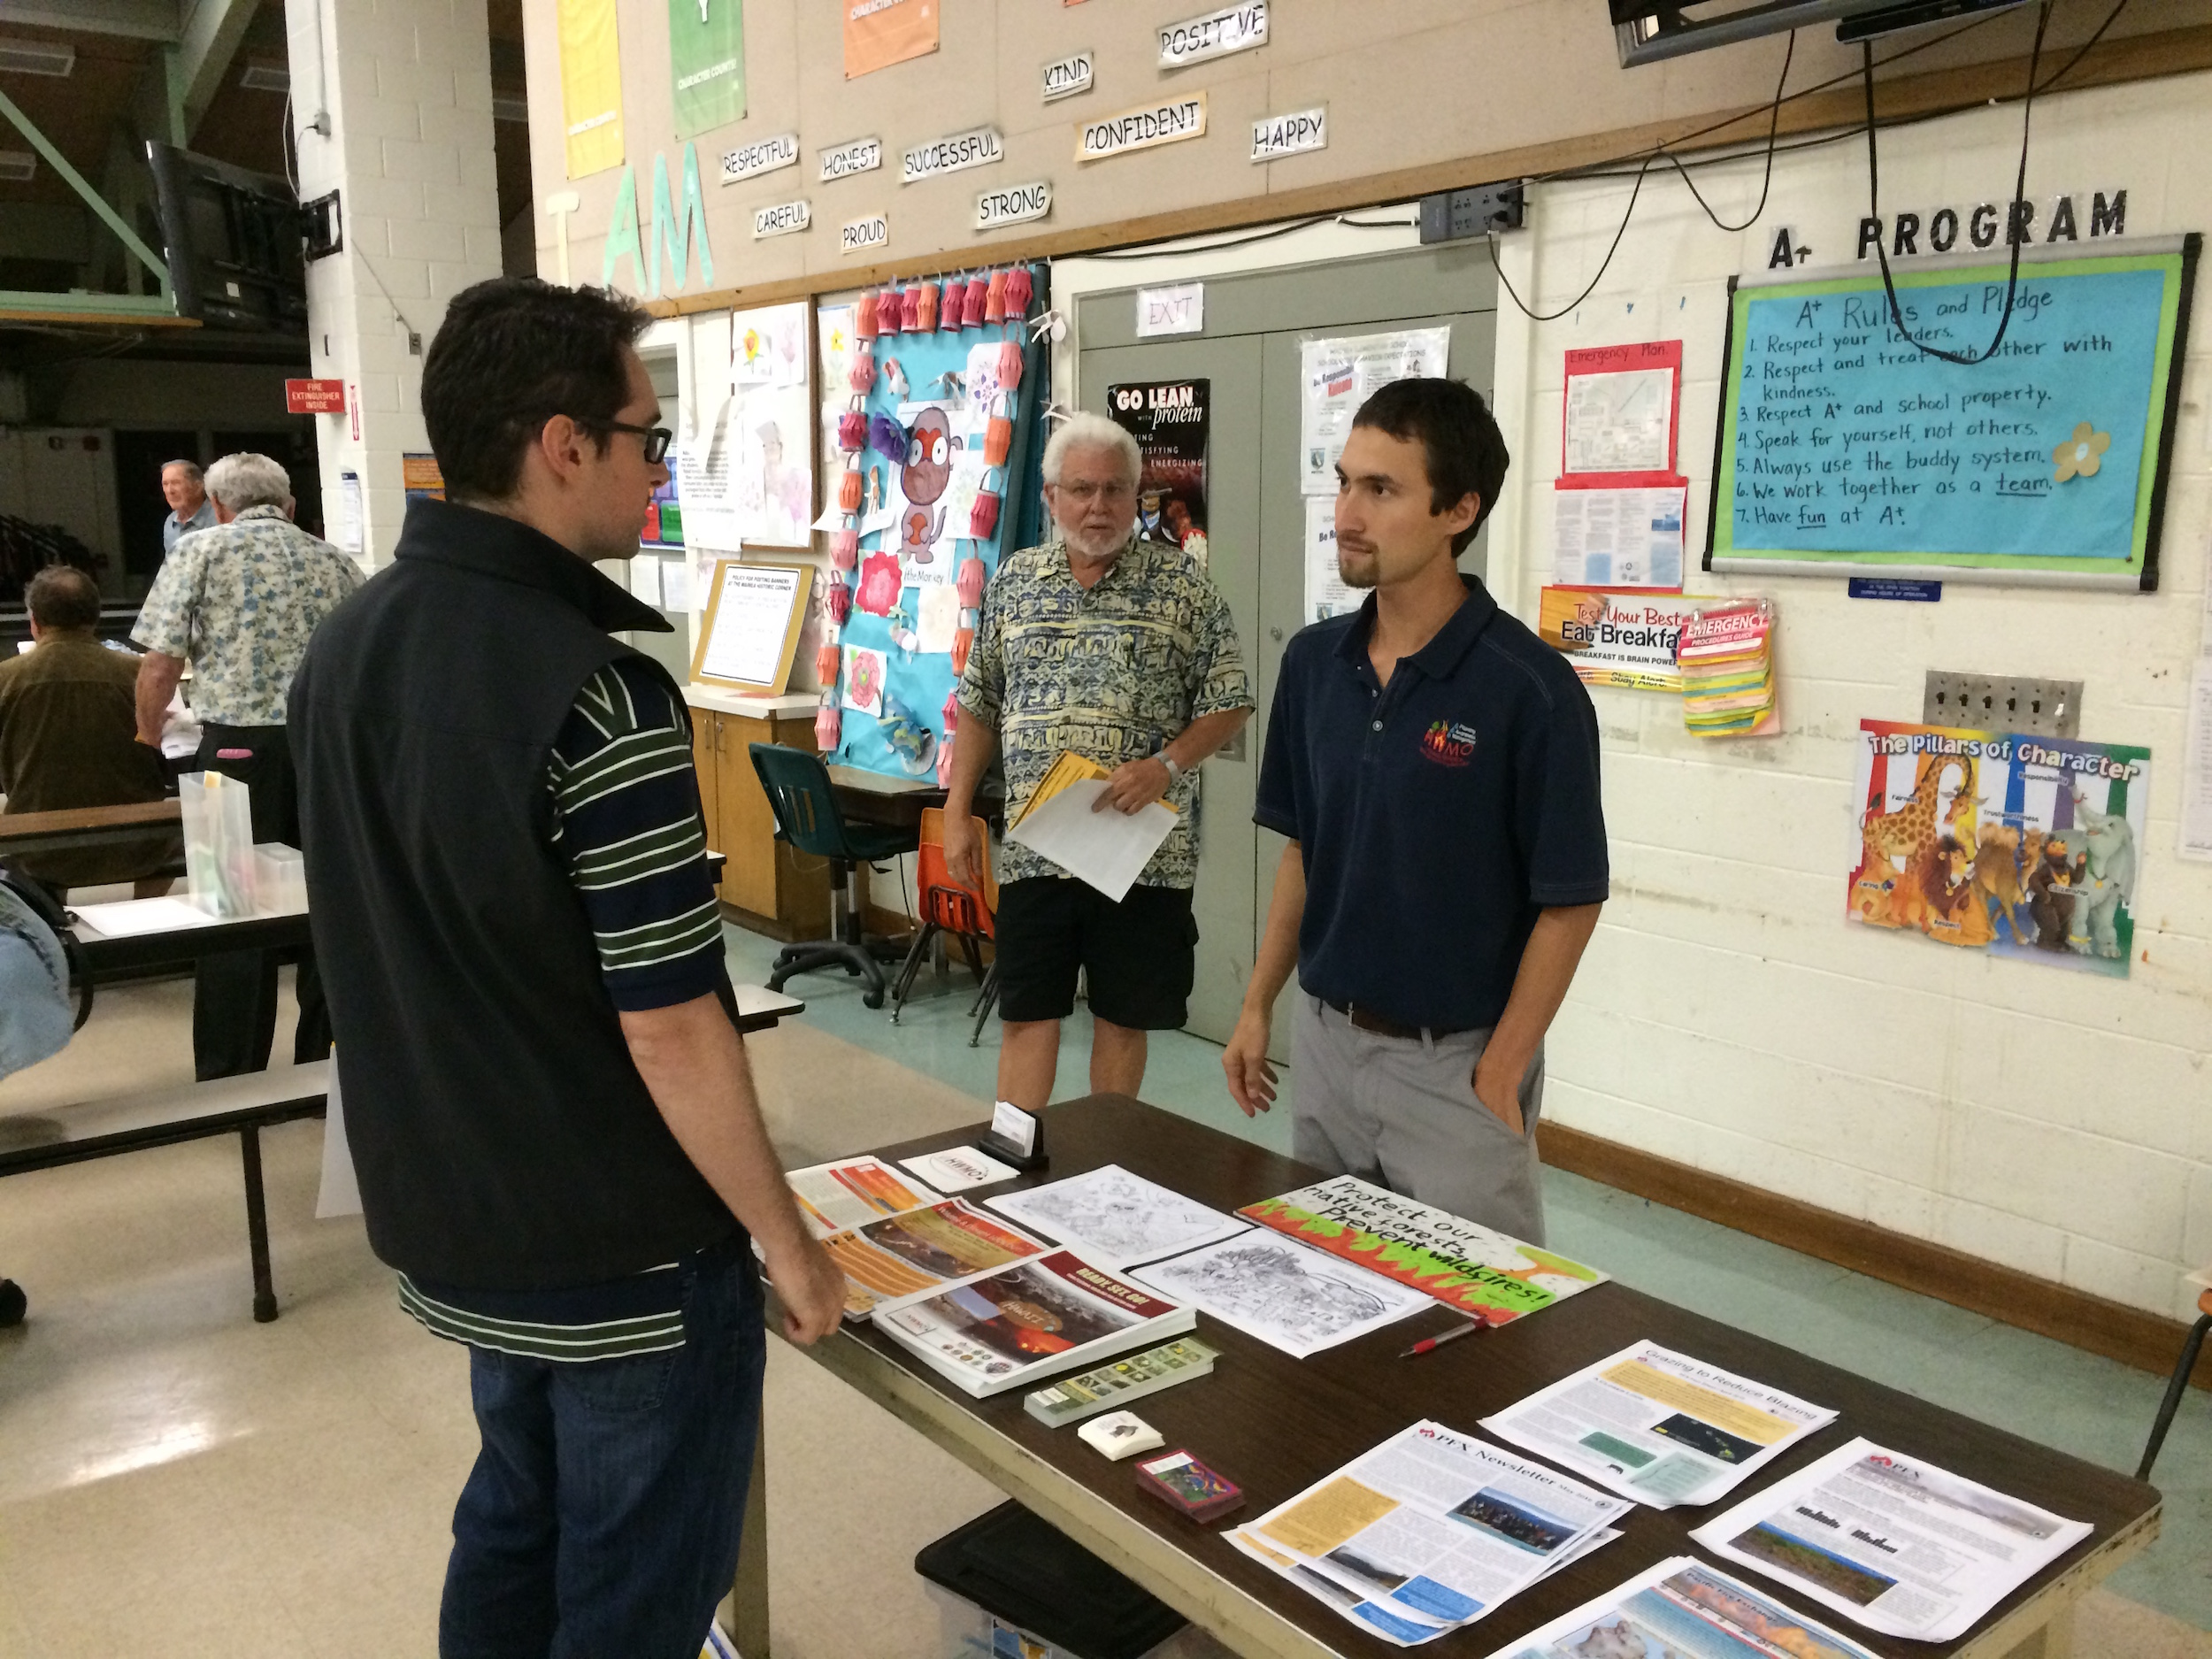 Pablo Beimler speaks with community member about wildfire preparedness.